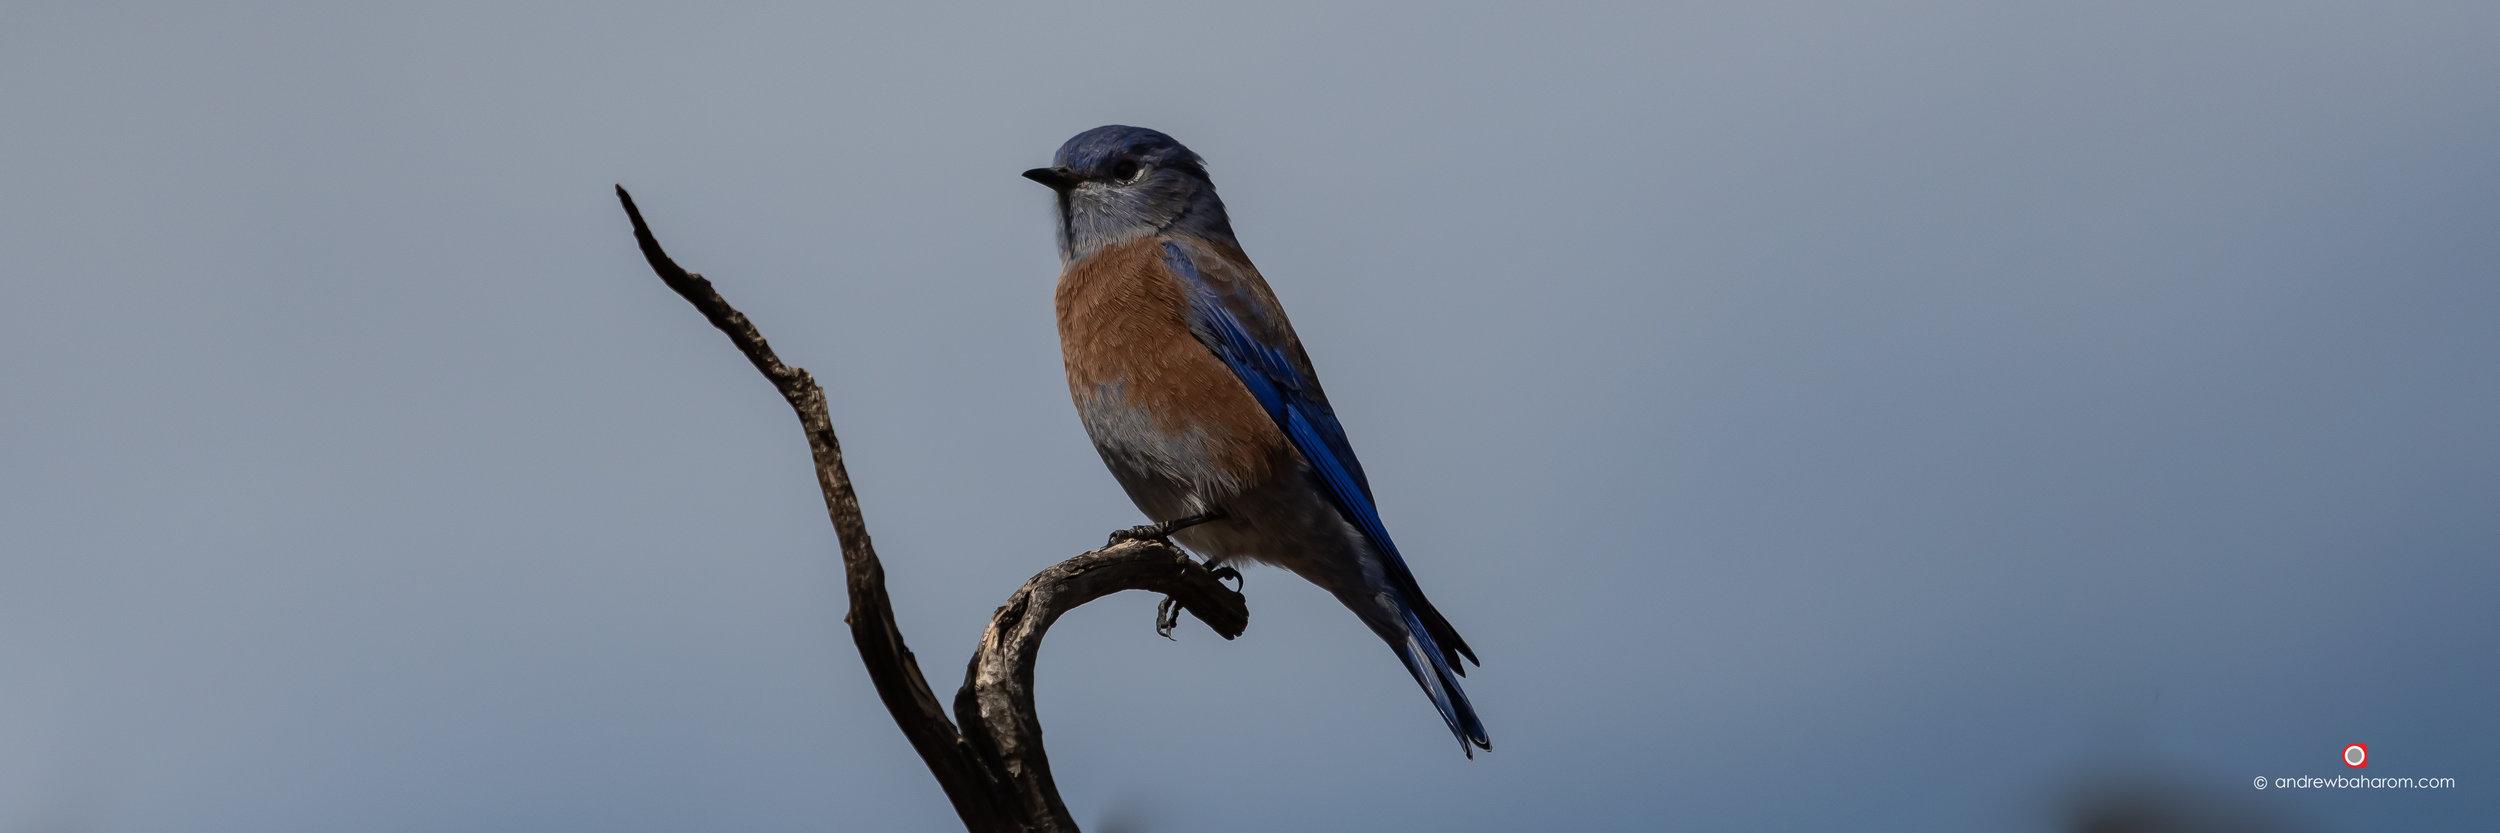 Blue & Brown Bird.jpg